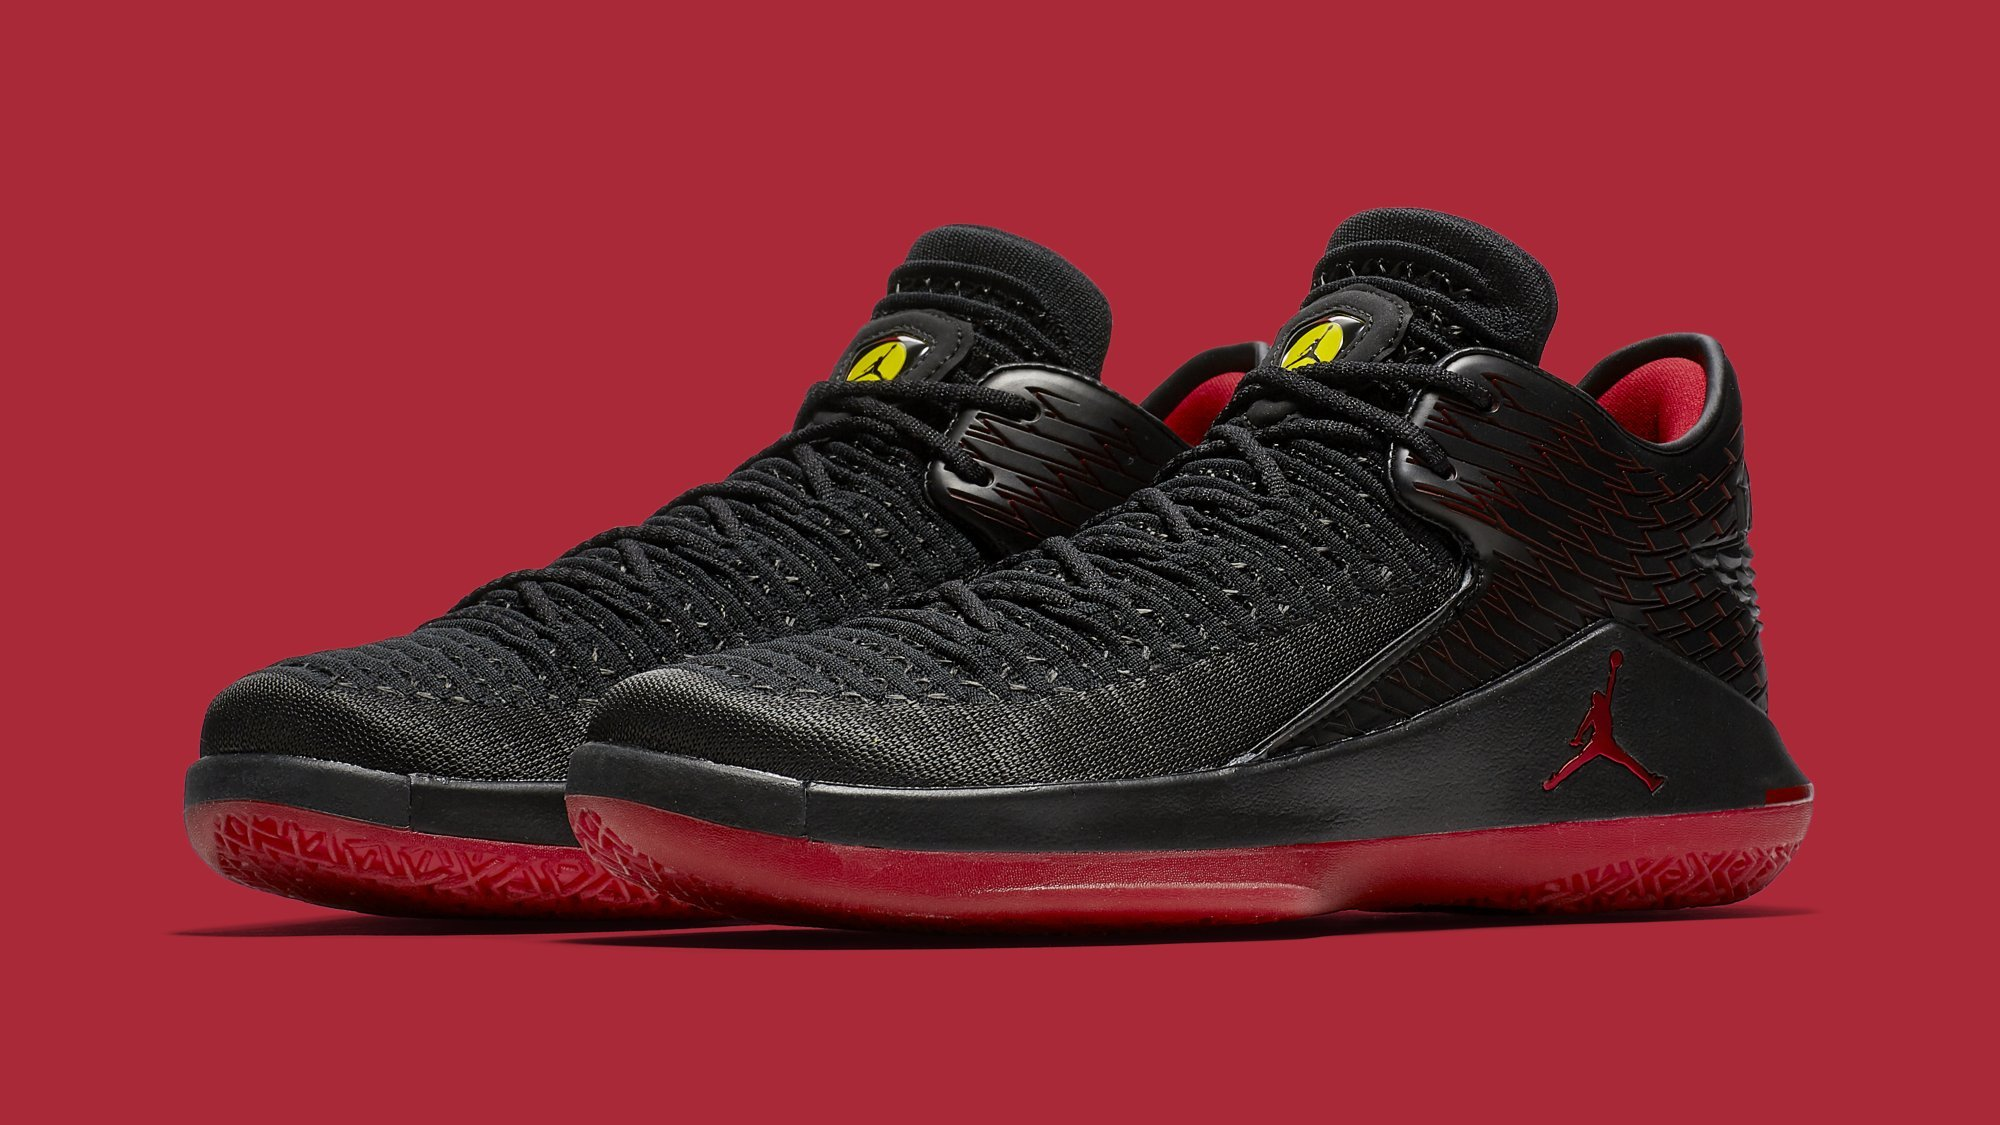 c205ae93cc6 Air Jordan XXXII Low AJ 32 Hot Pink White Men's Basketball Shoes